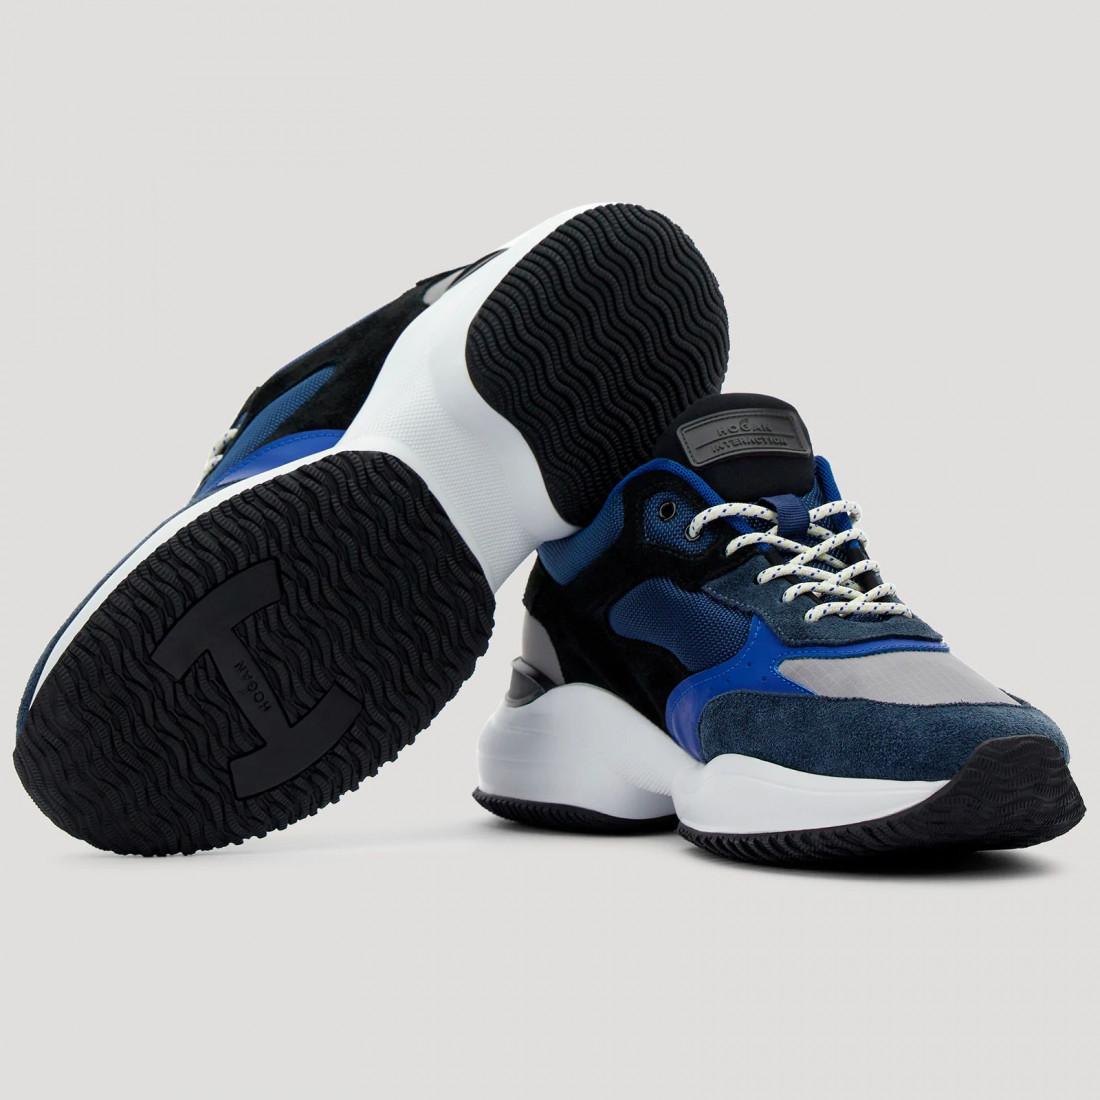 sneakers man hogan hxm5450dh10pfg841p 8175